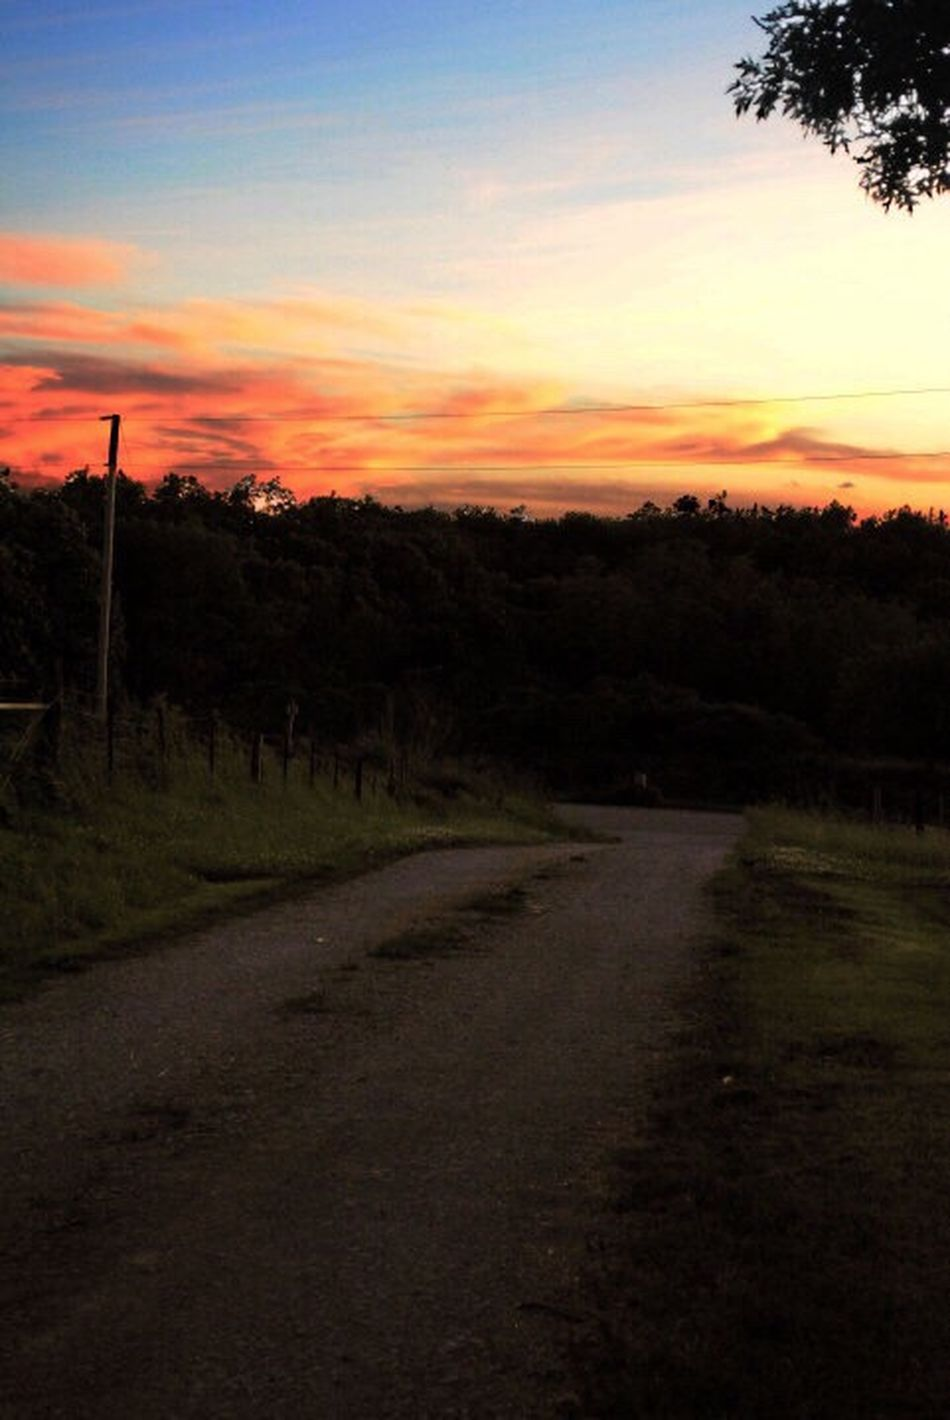 Sunset Gravel Road Pureexpressions